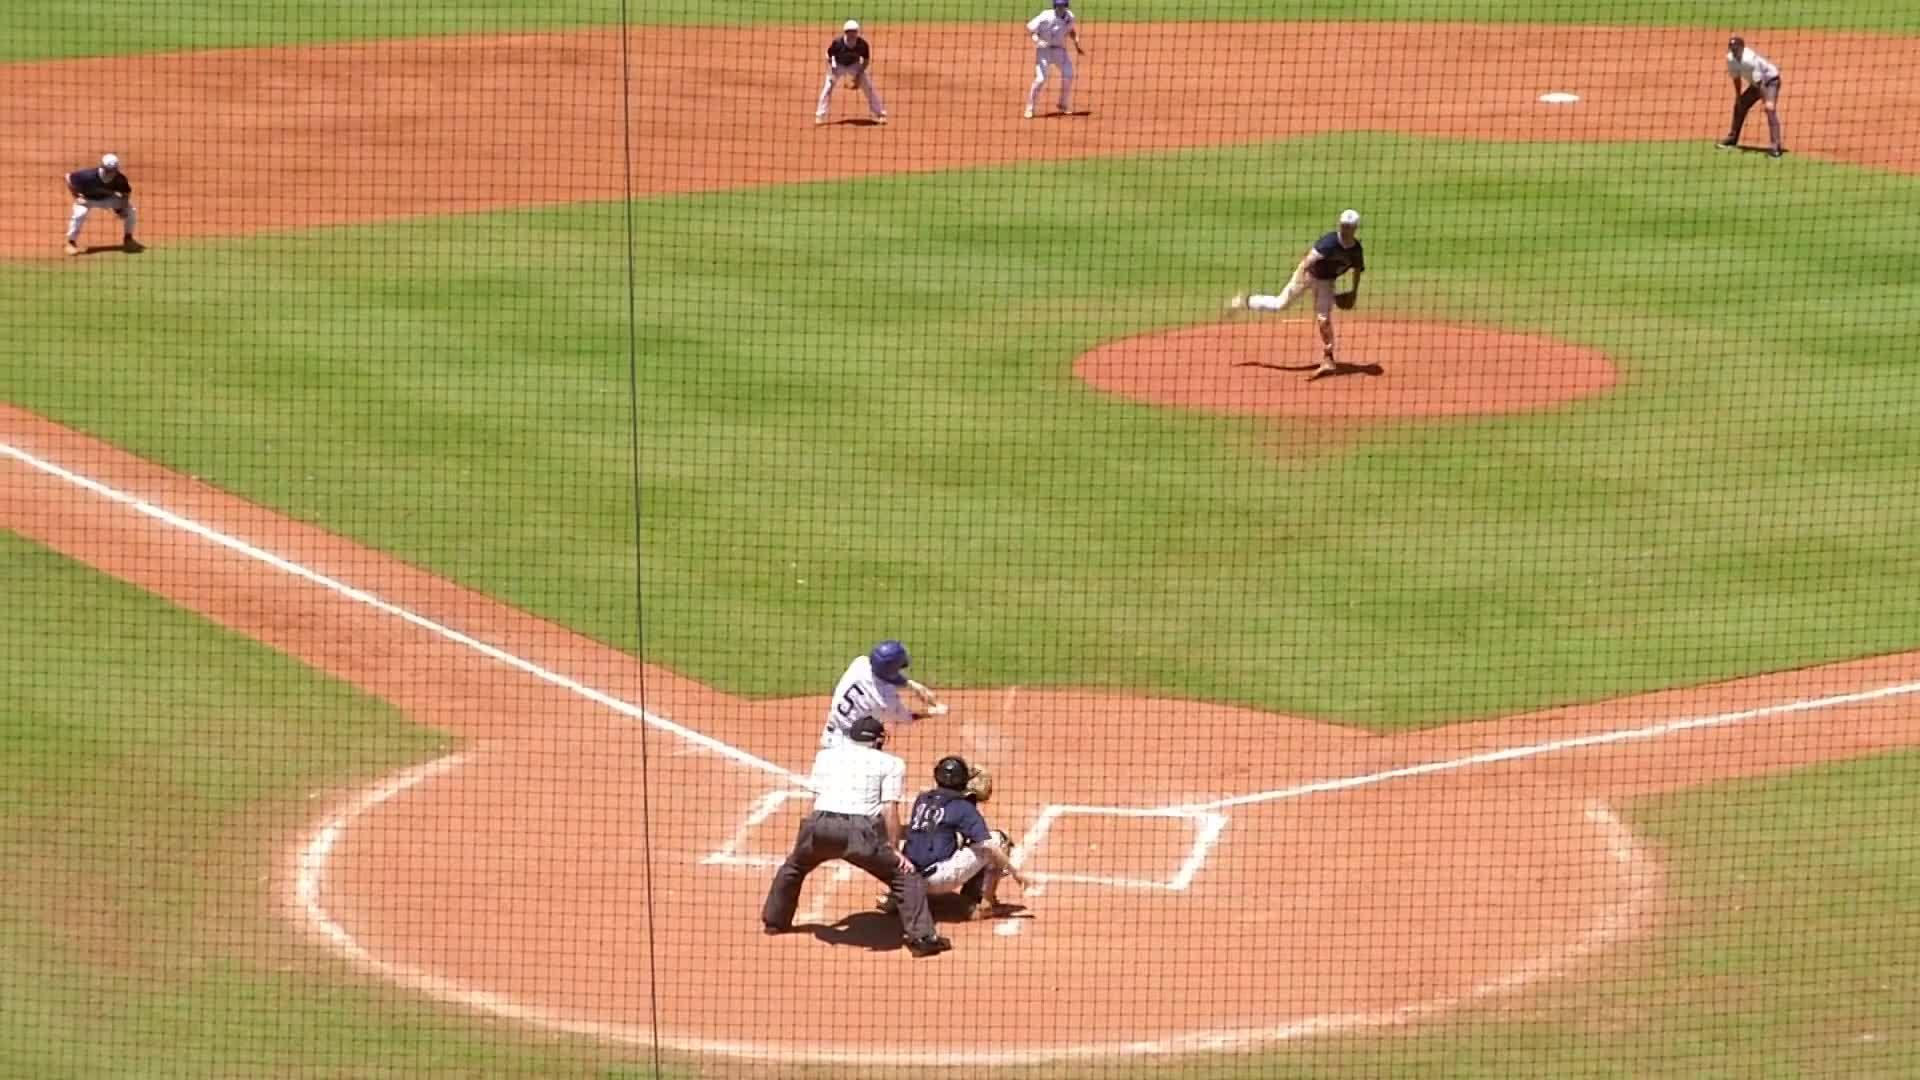 Piedmont baseball falls in championship series